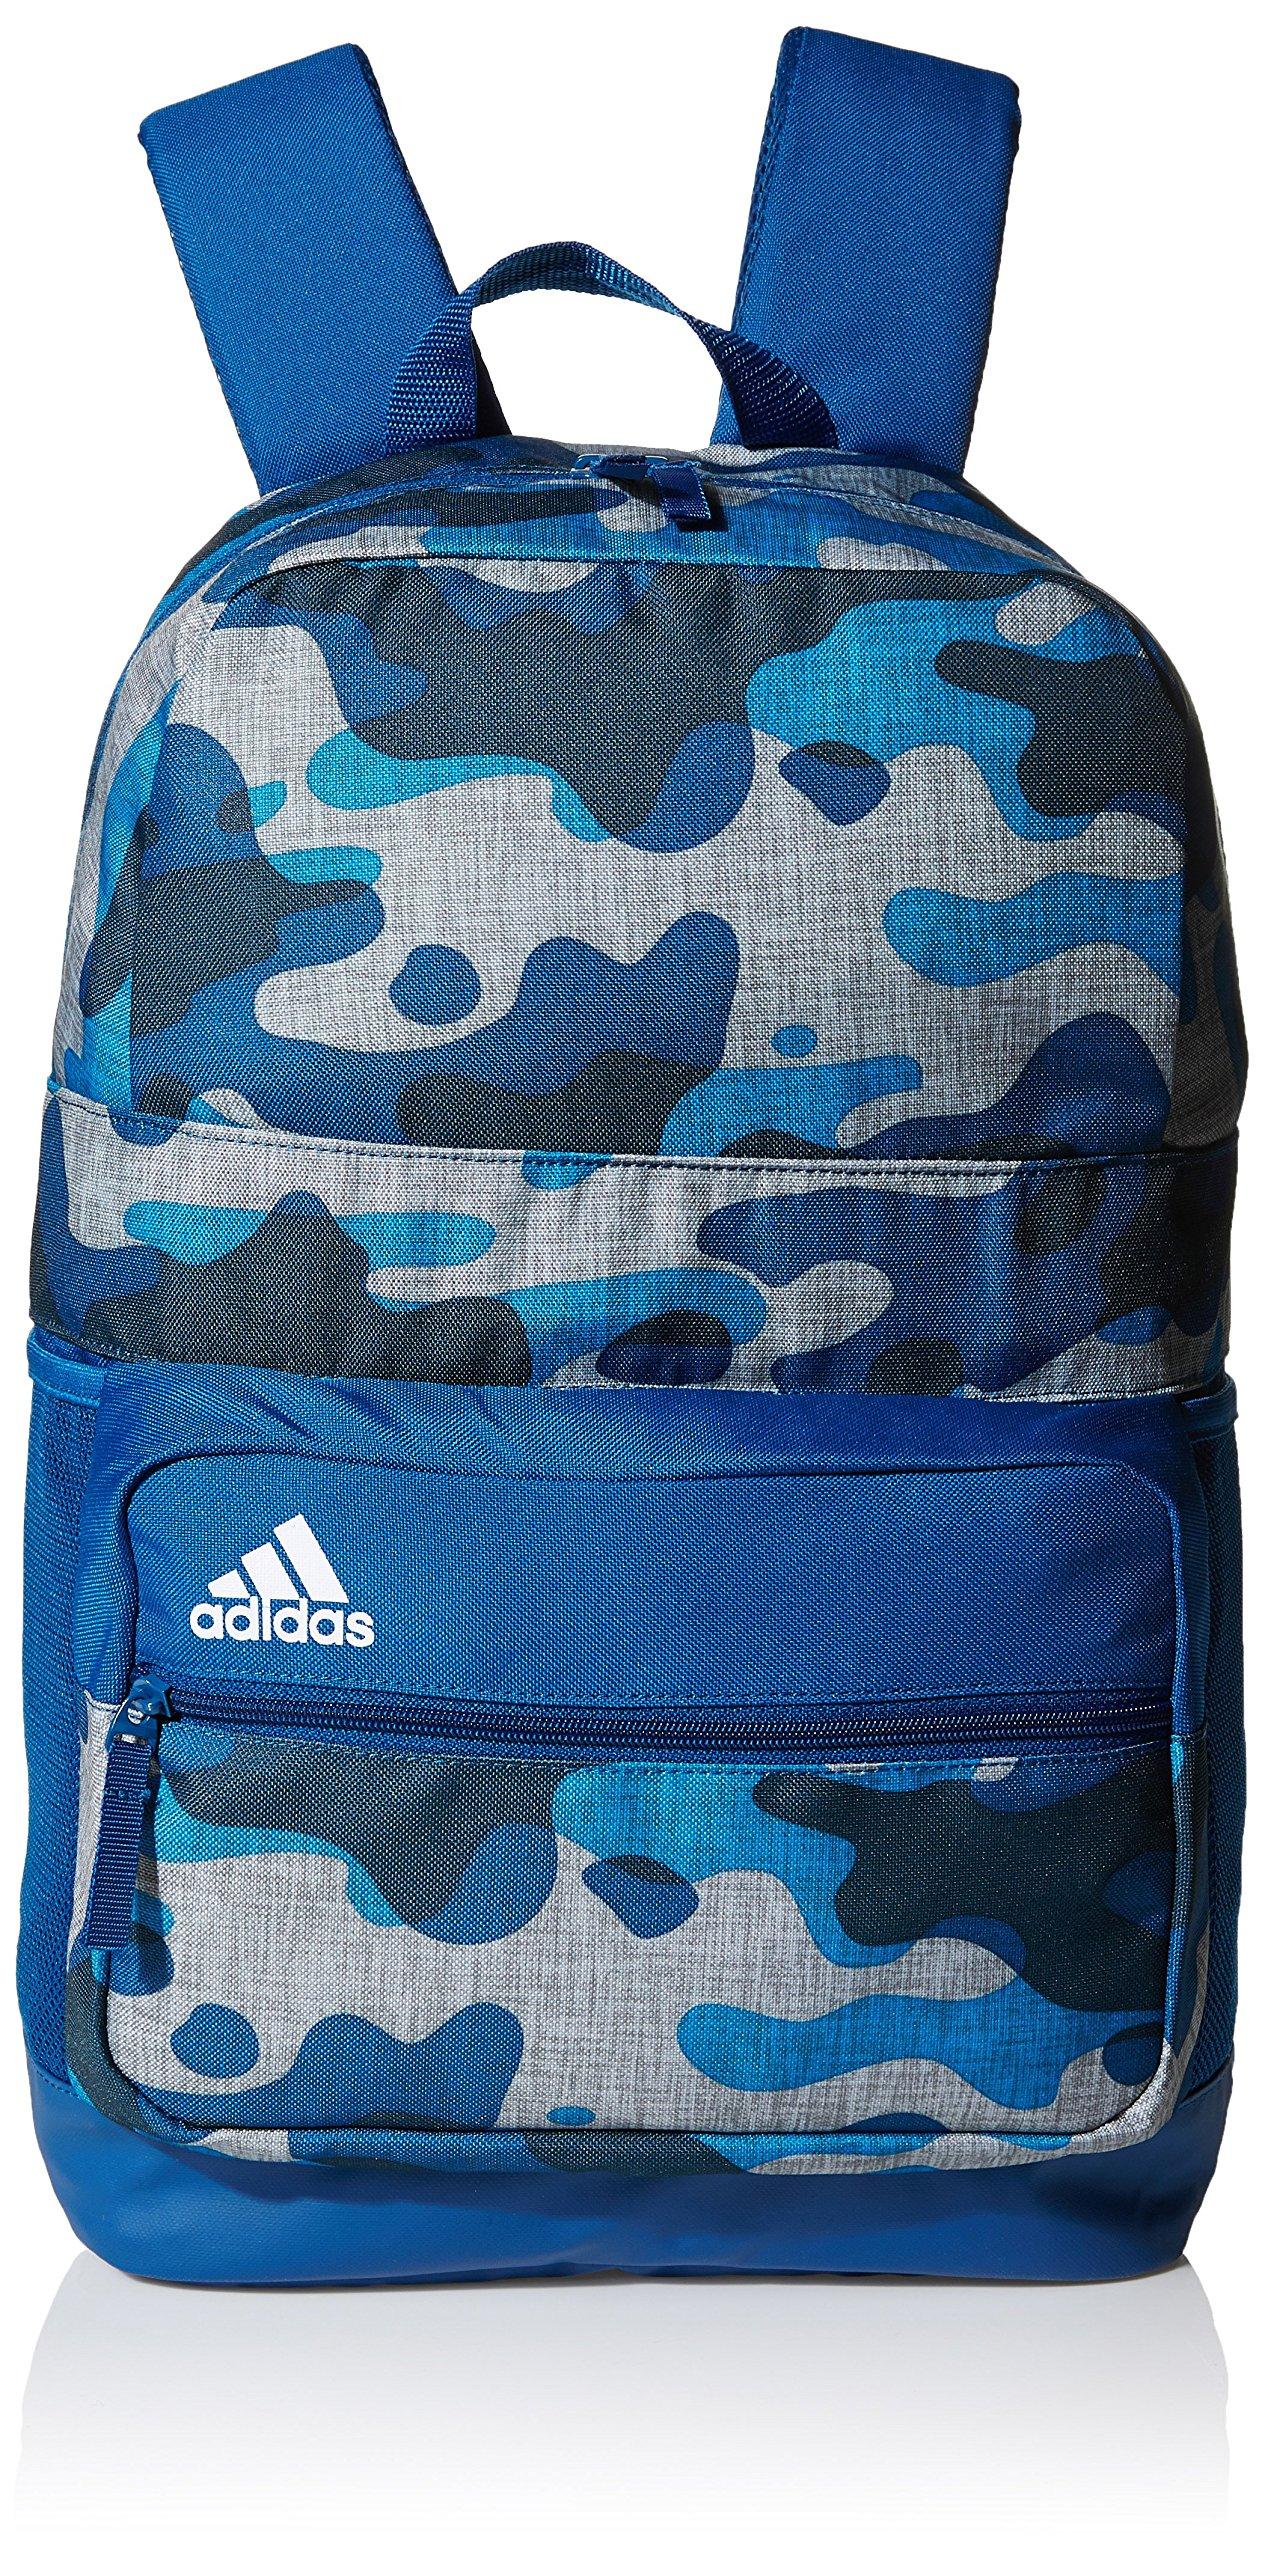 Bags – Adidas Fashions 86a1d615f1aec